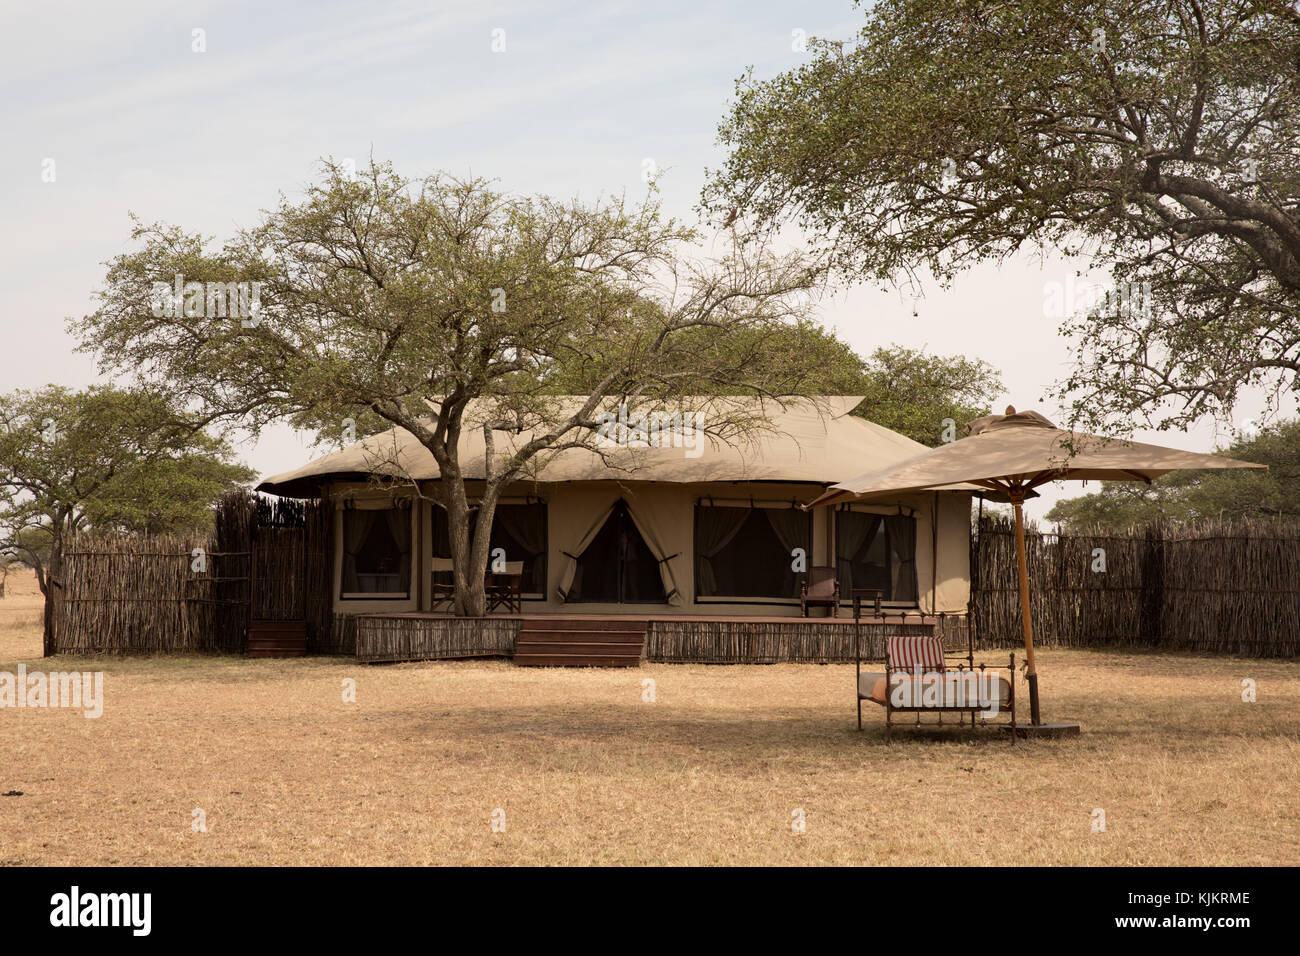 Serengeti National Park. Singita Sabora Tented Camp. Tanzania. - Stock Image